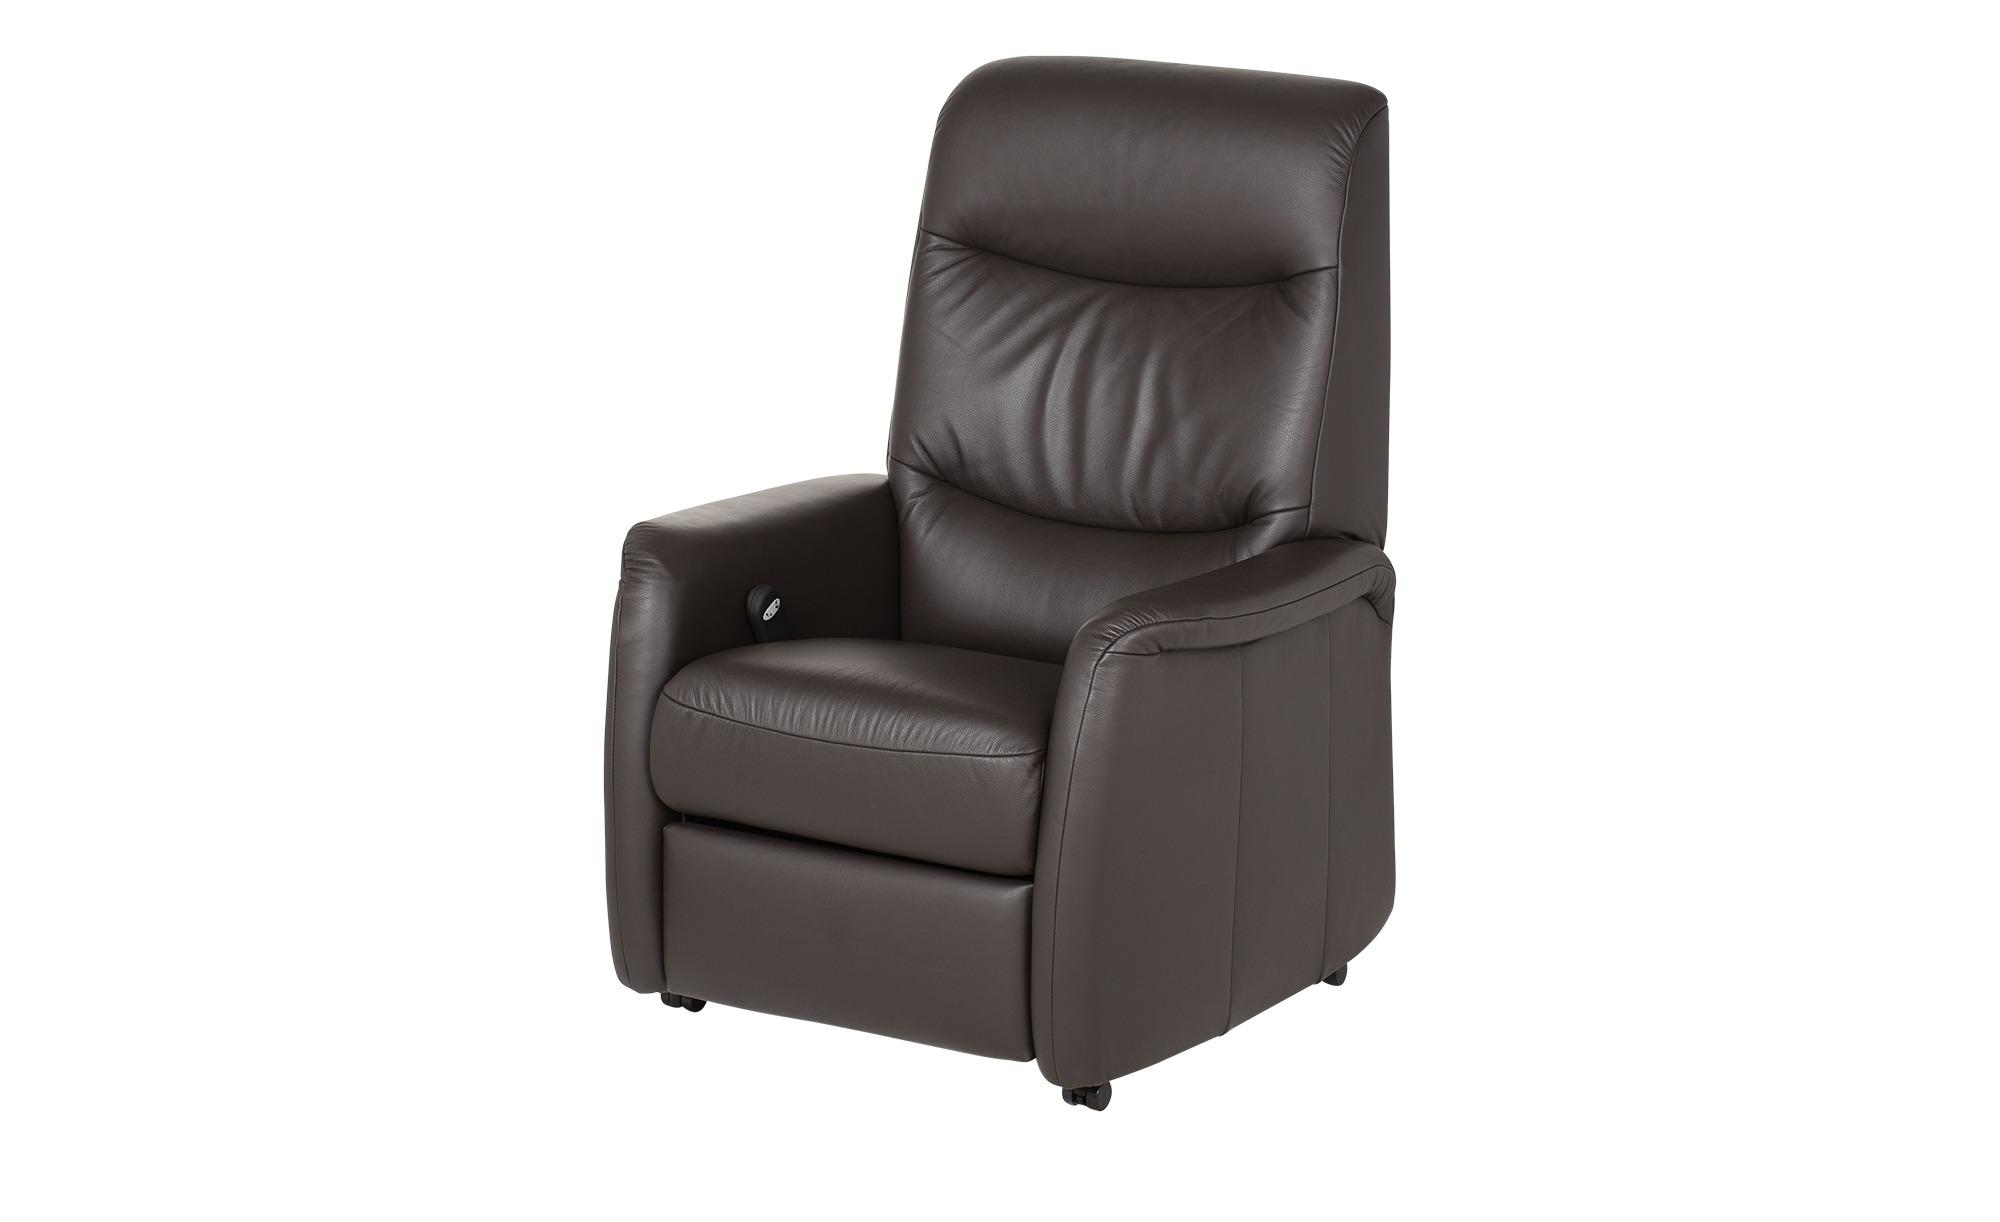 Hukla Fernsehsessel mit elektrischer Relaxfunktion  Fenja ¦ braun ¦ Maße (cm): B: 78 H: 104 T: 87 Polstermöbel > Sessel > Ledersessel - Höffner